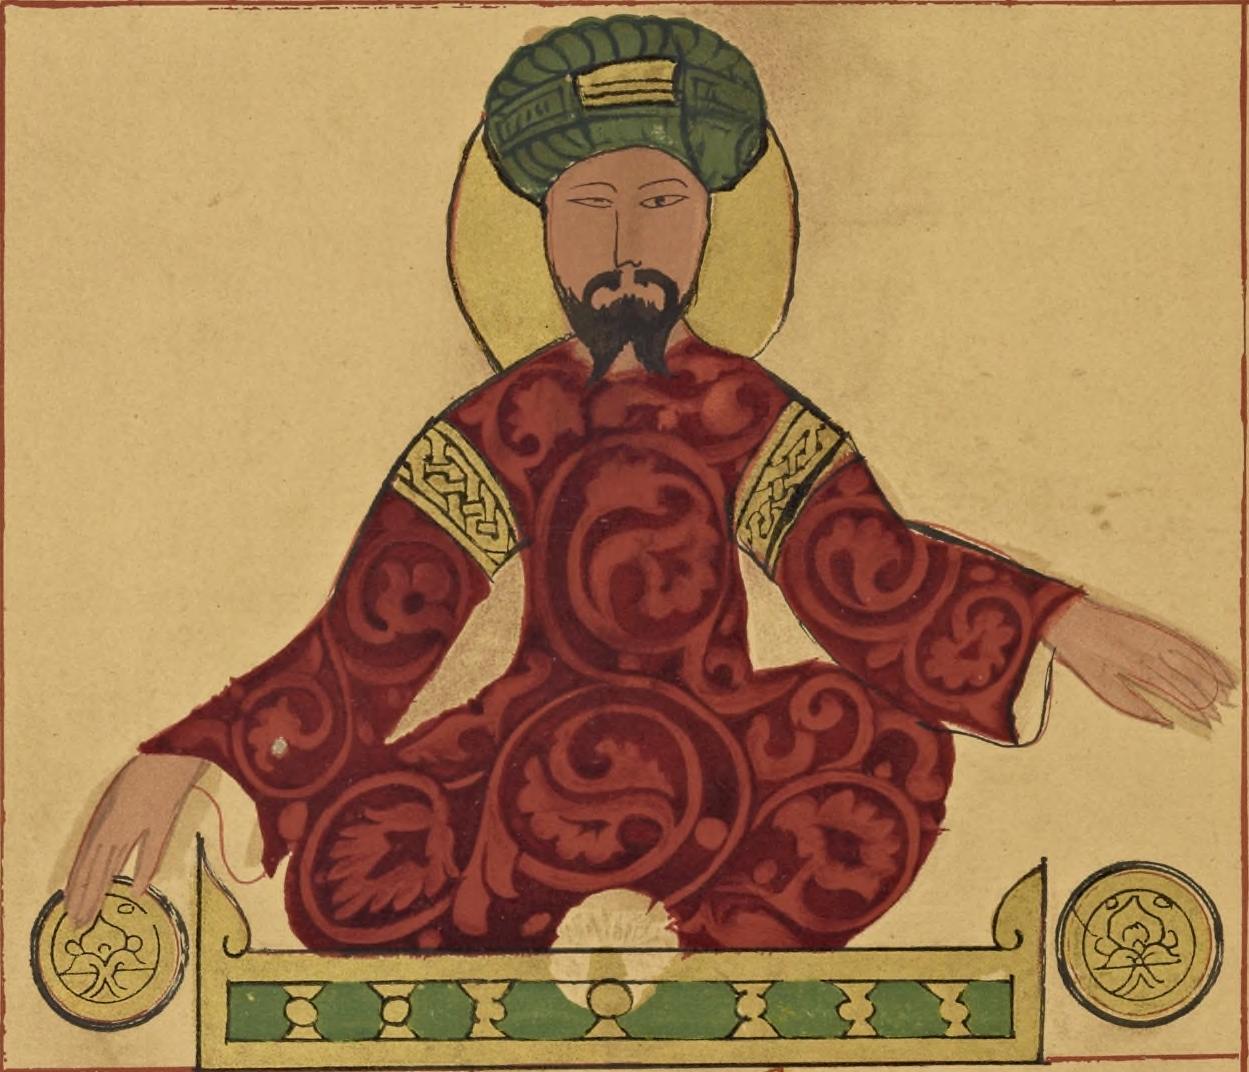 Depiction of Saladino